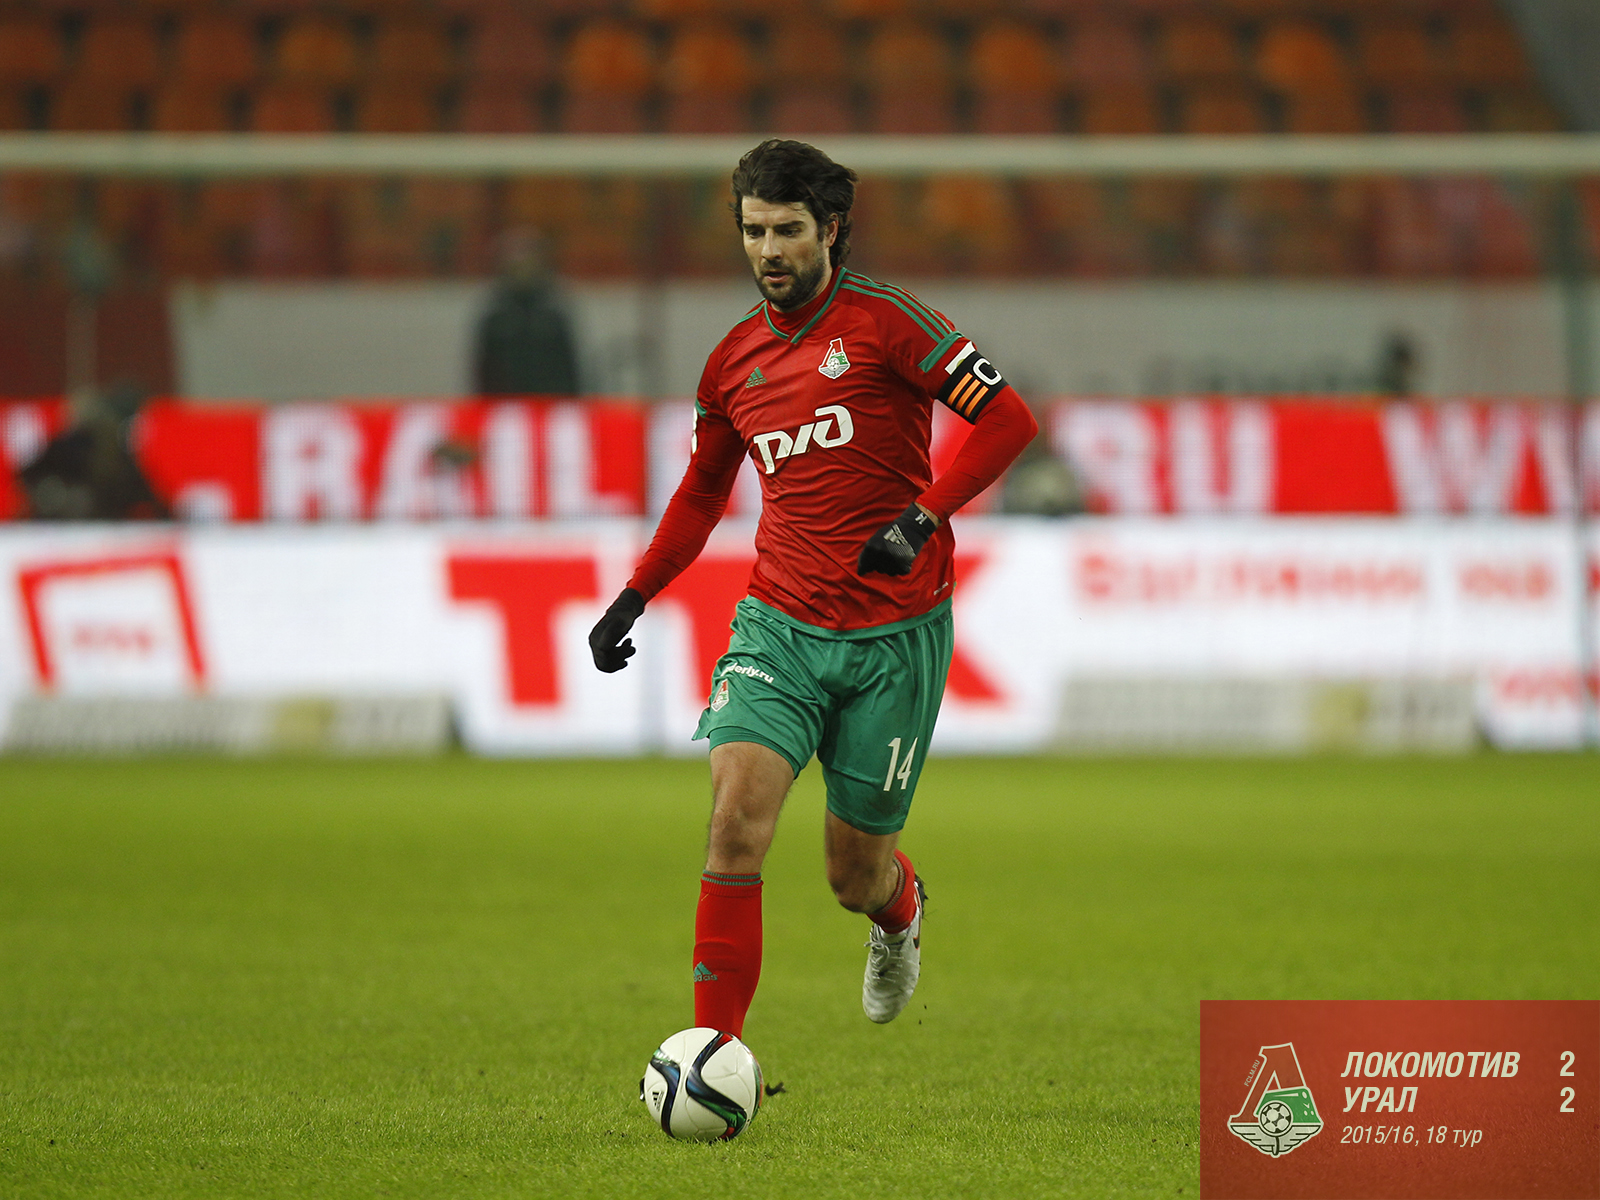 «Локомотив» - «Урал» - 2:2